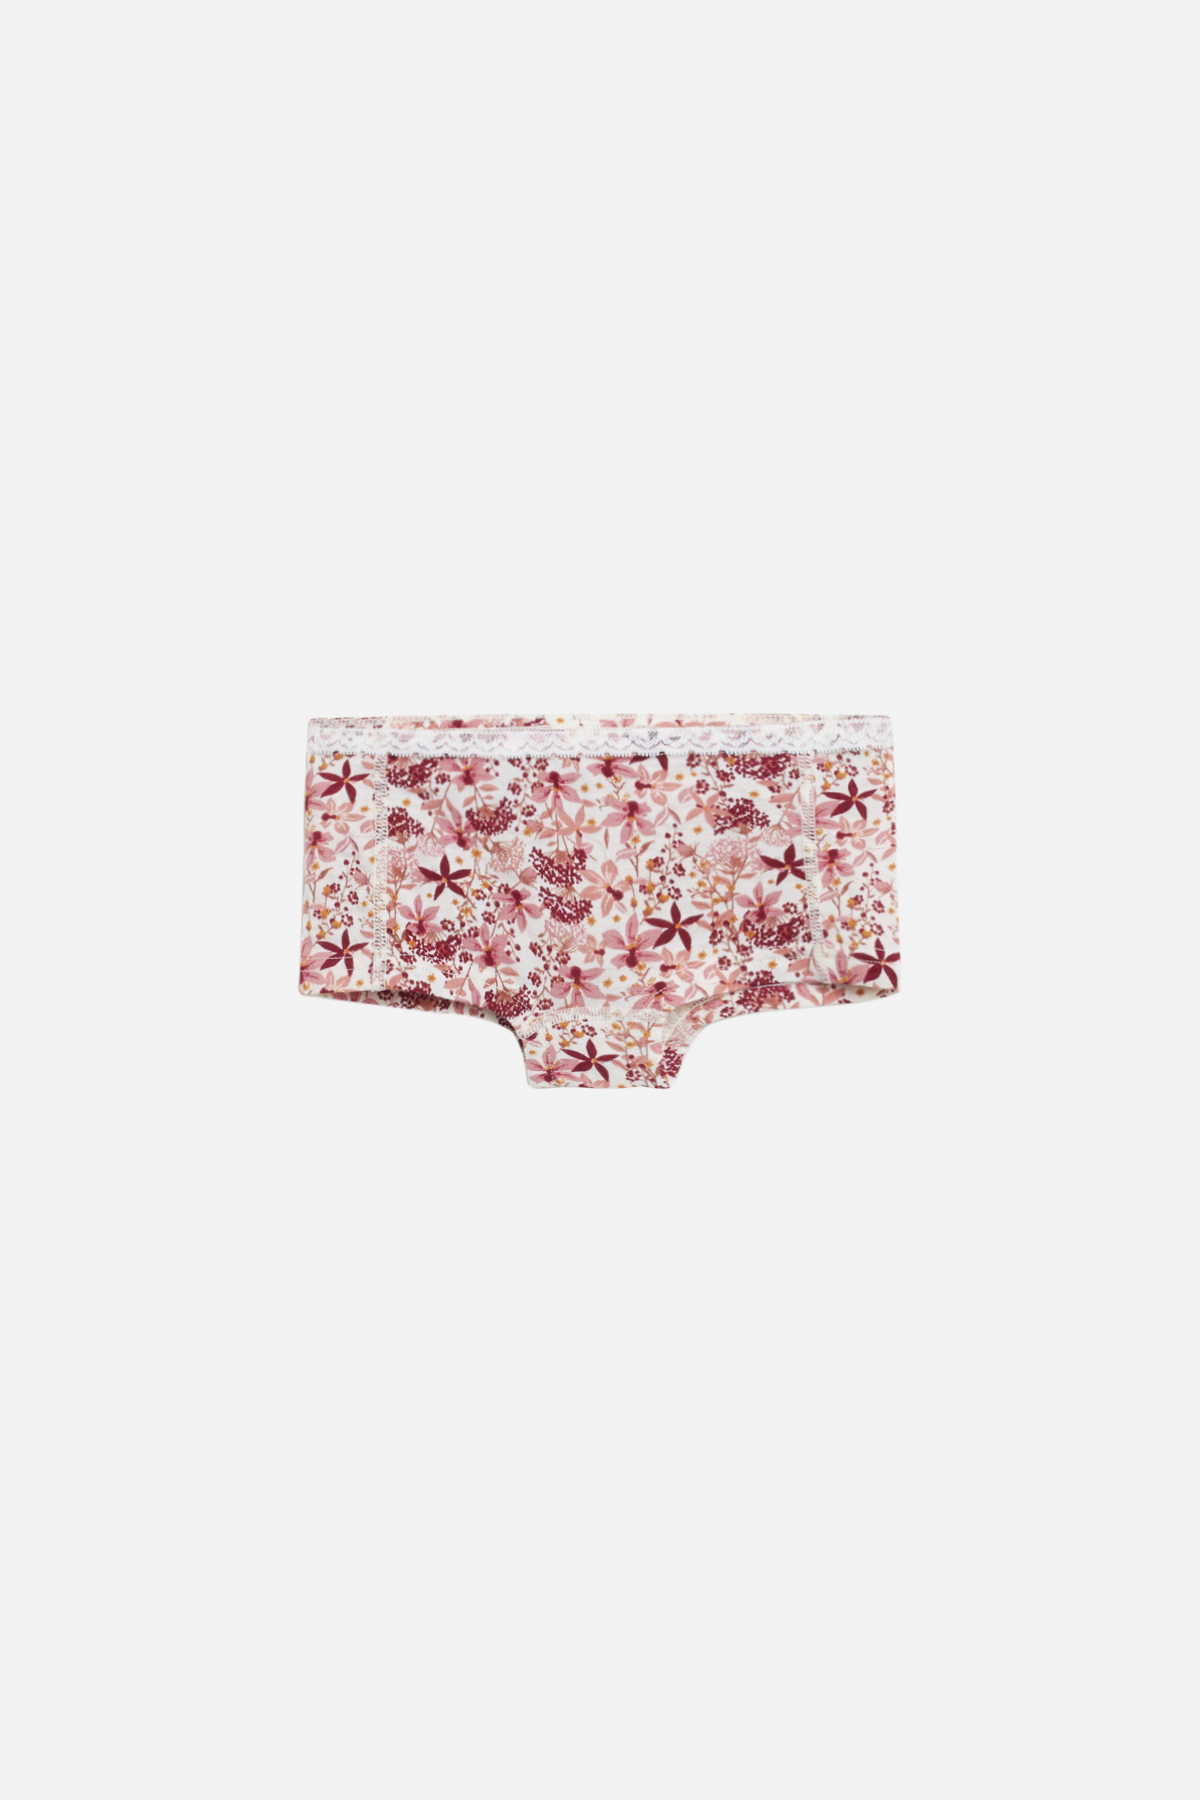 Wool/Silk - Fiella - Panties